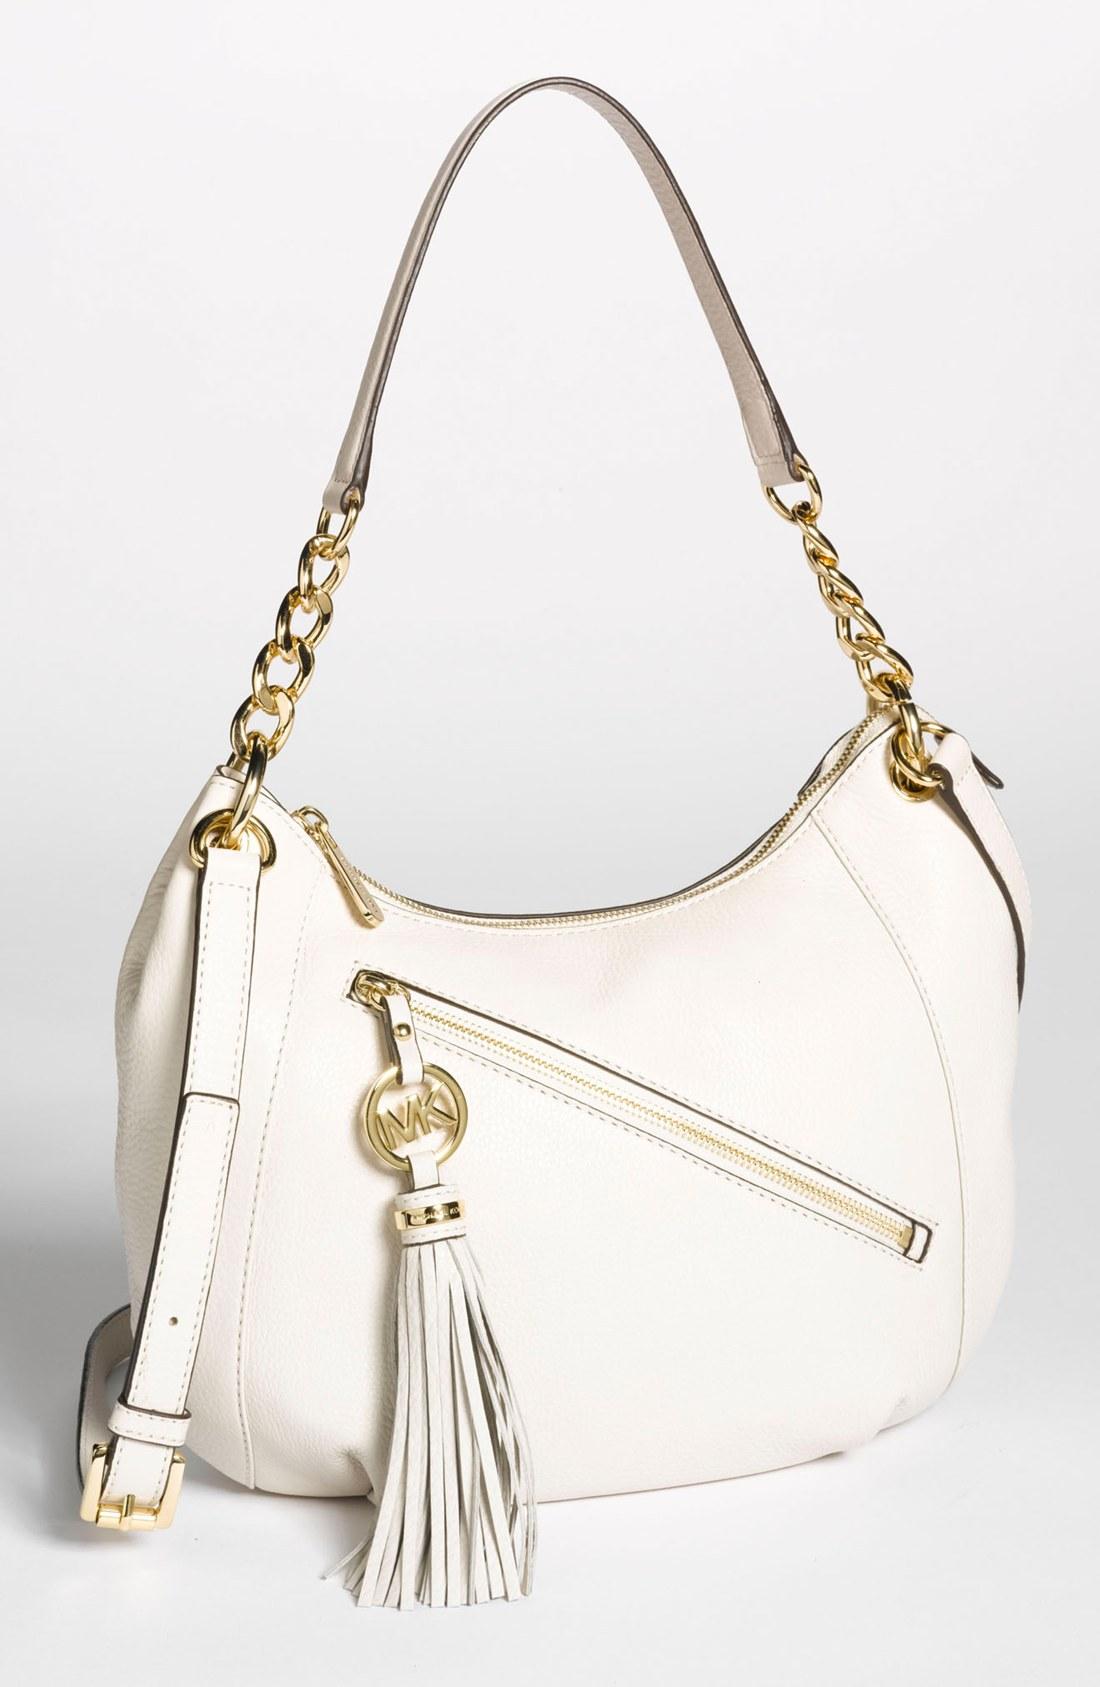 Michael Kors Charm Tassel Convertible Shoulder Bag Vanilla 54